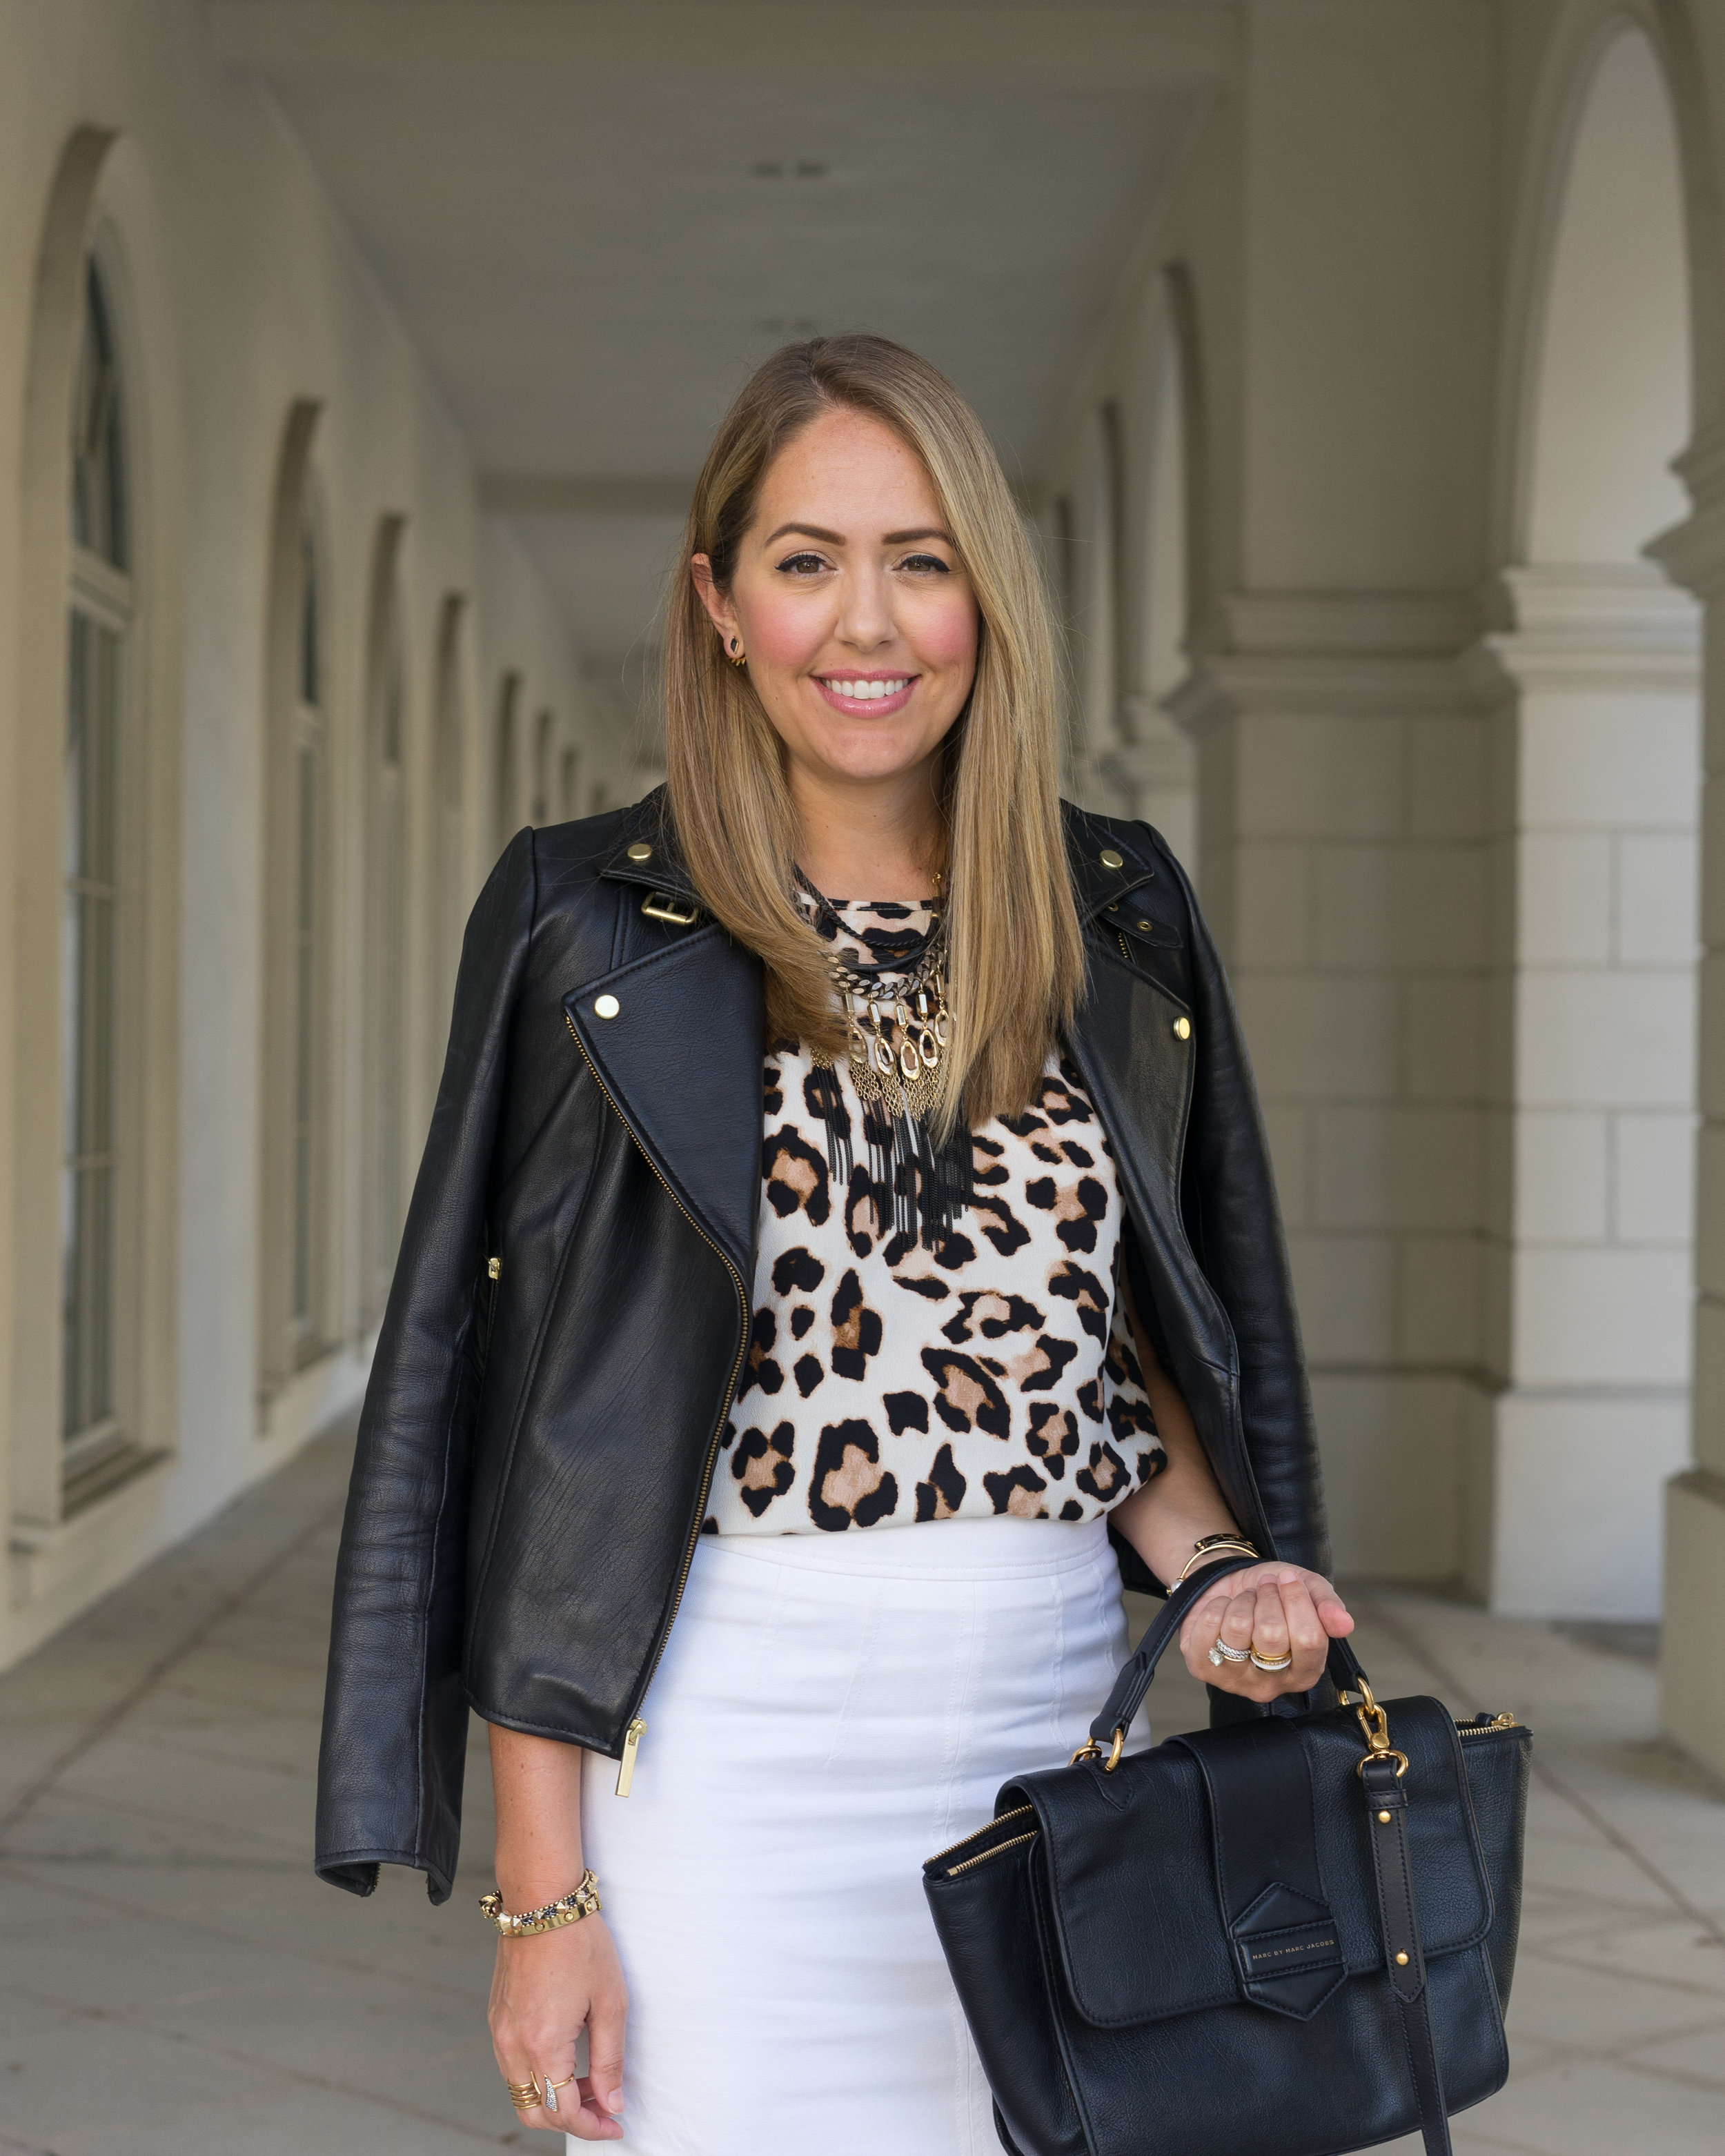 Black leather jacket, leopard top, white skirt